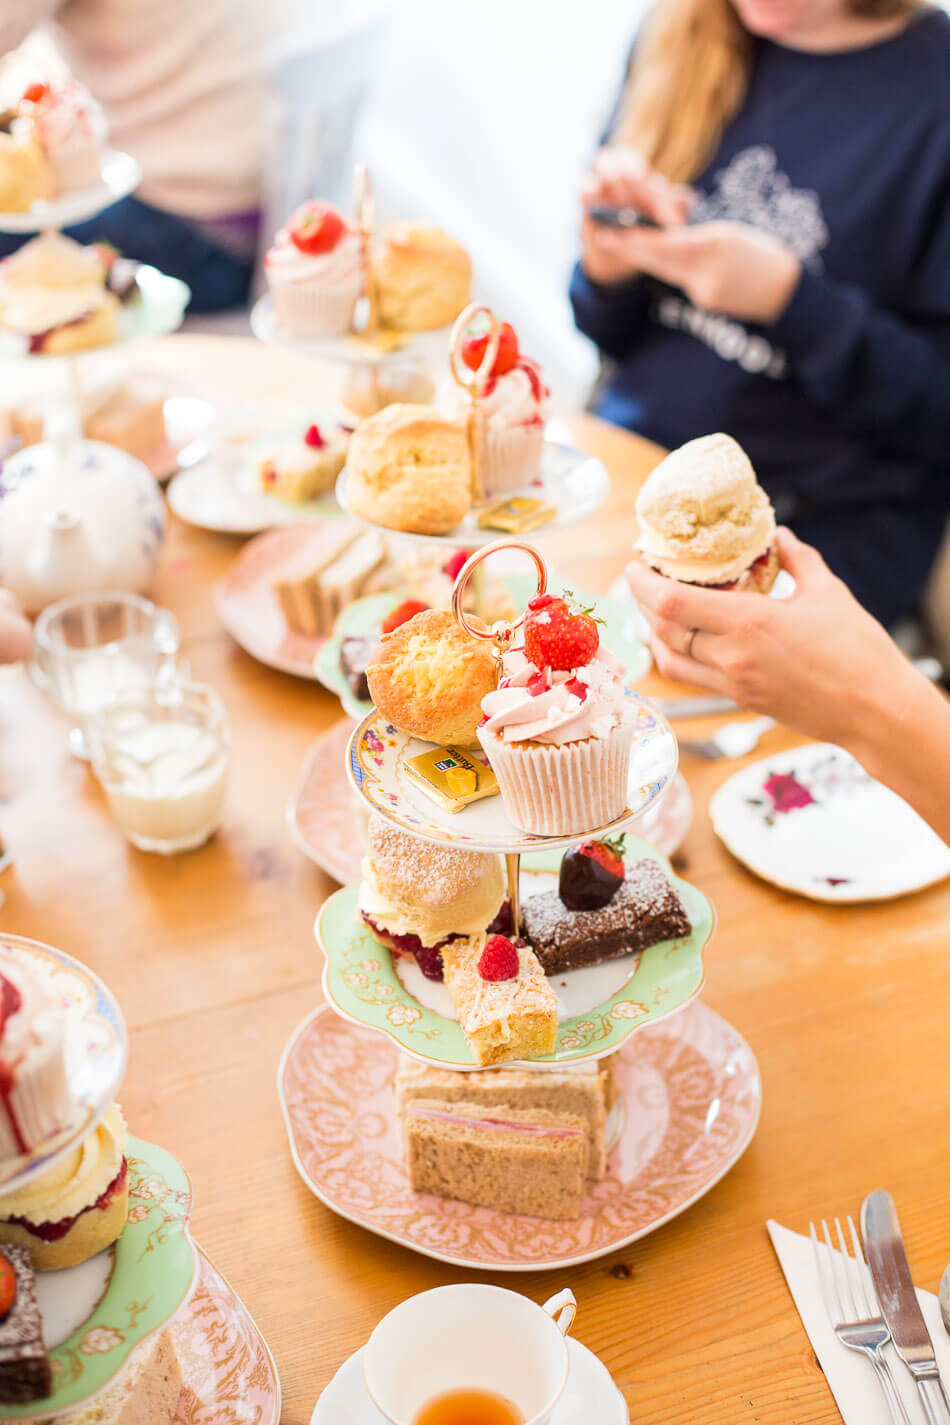 GB Cupcakery